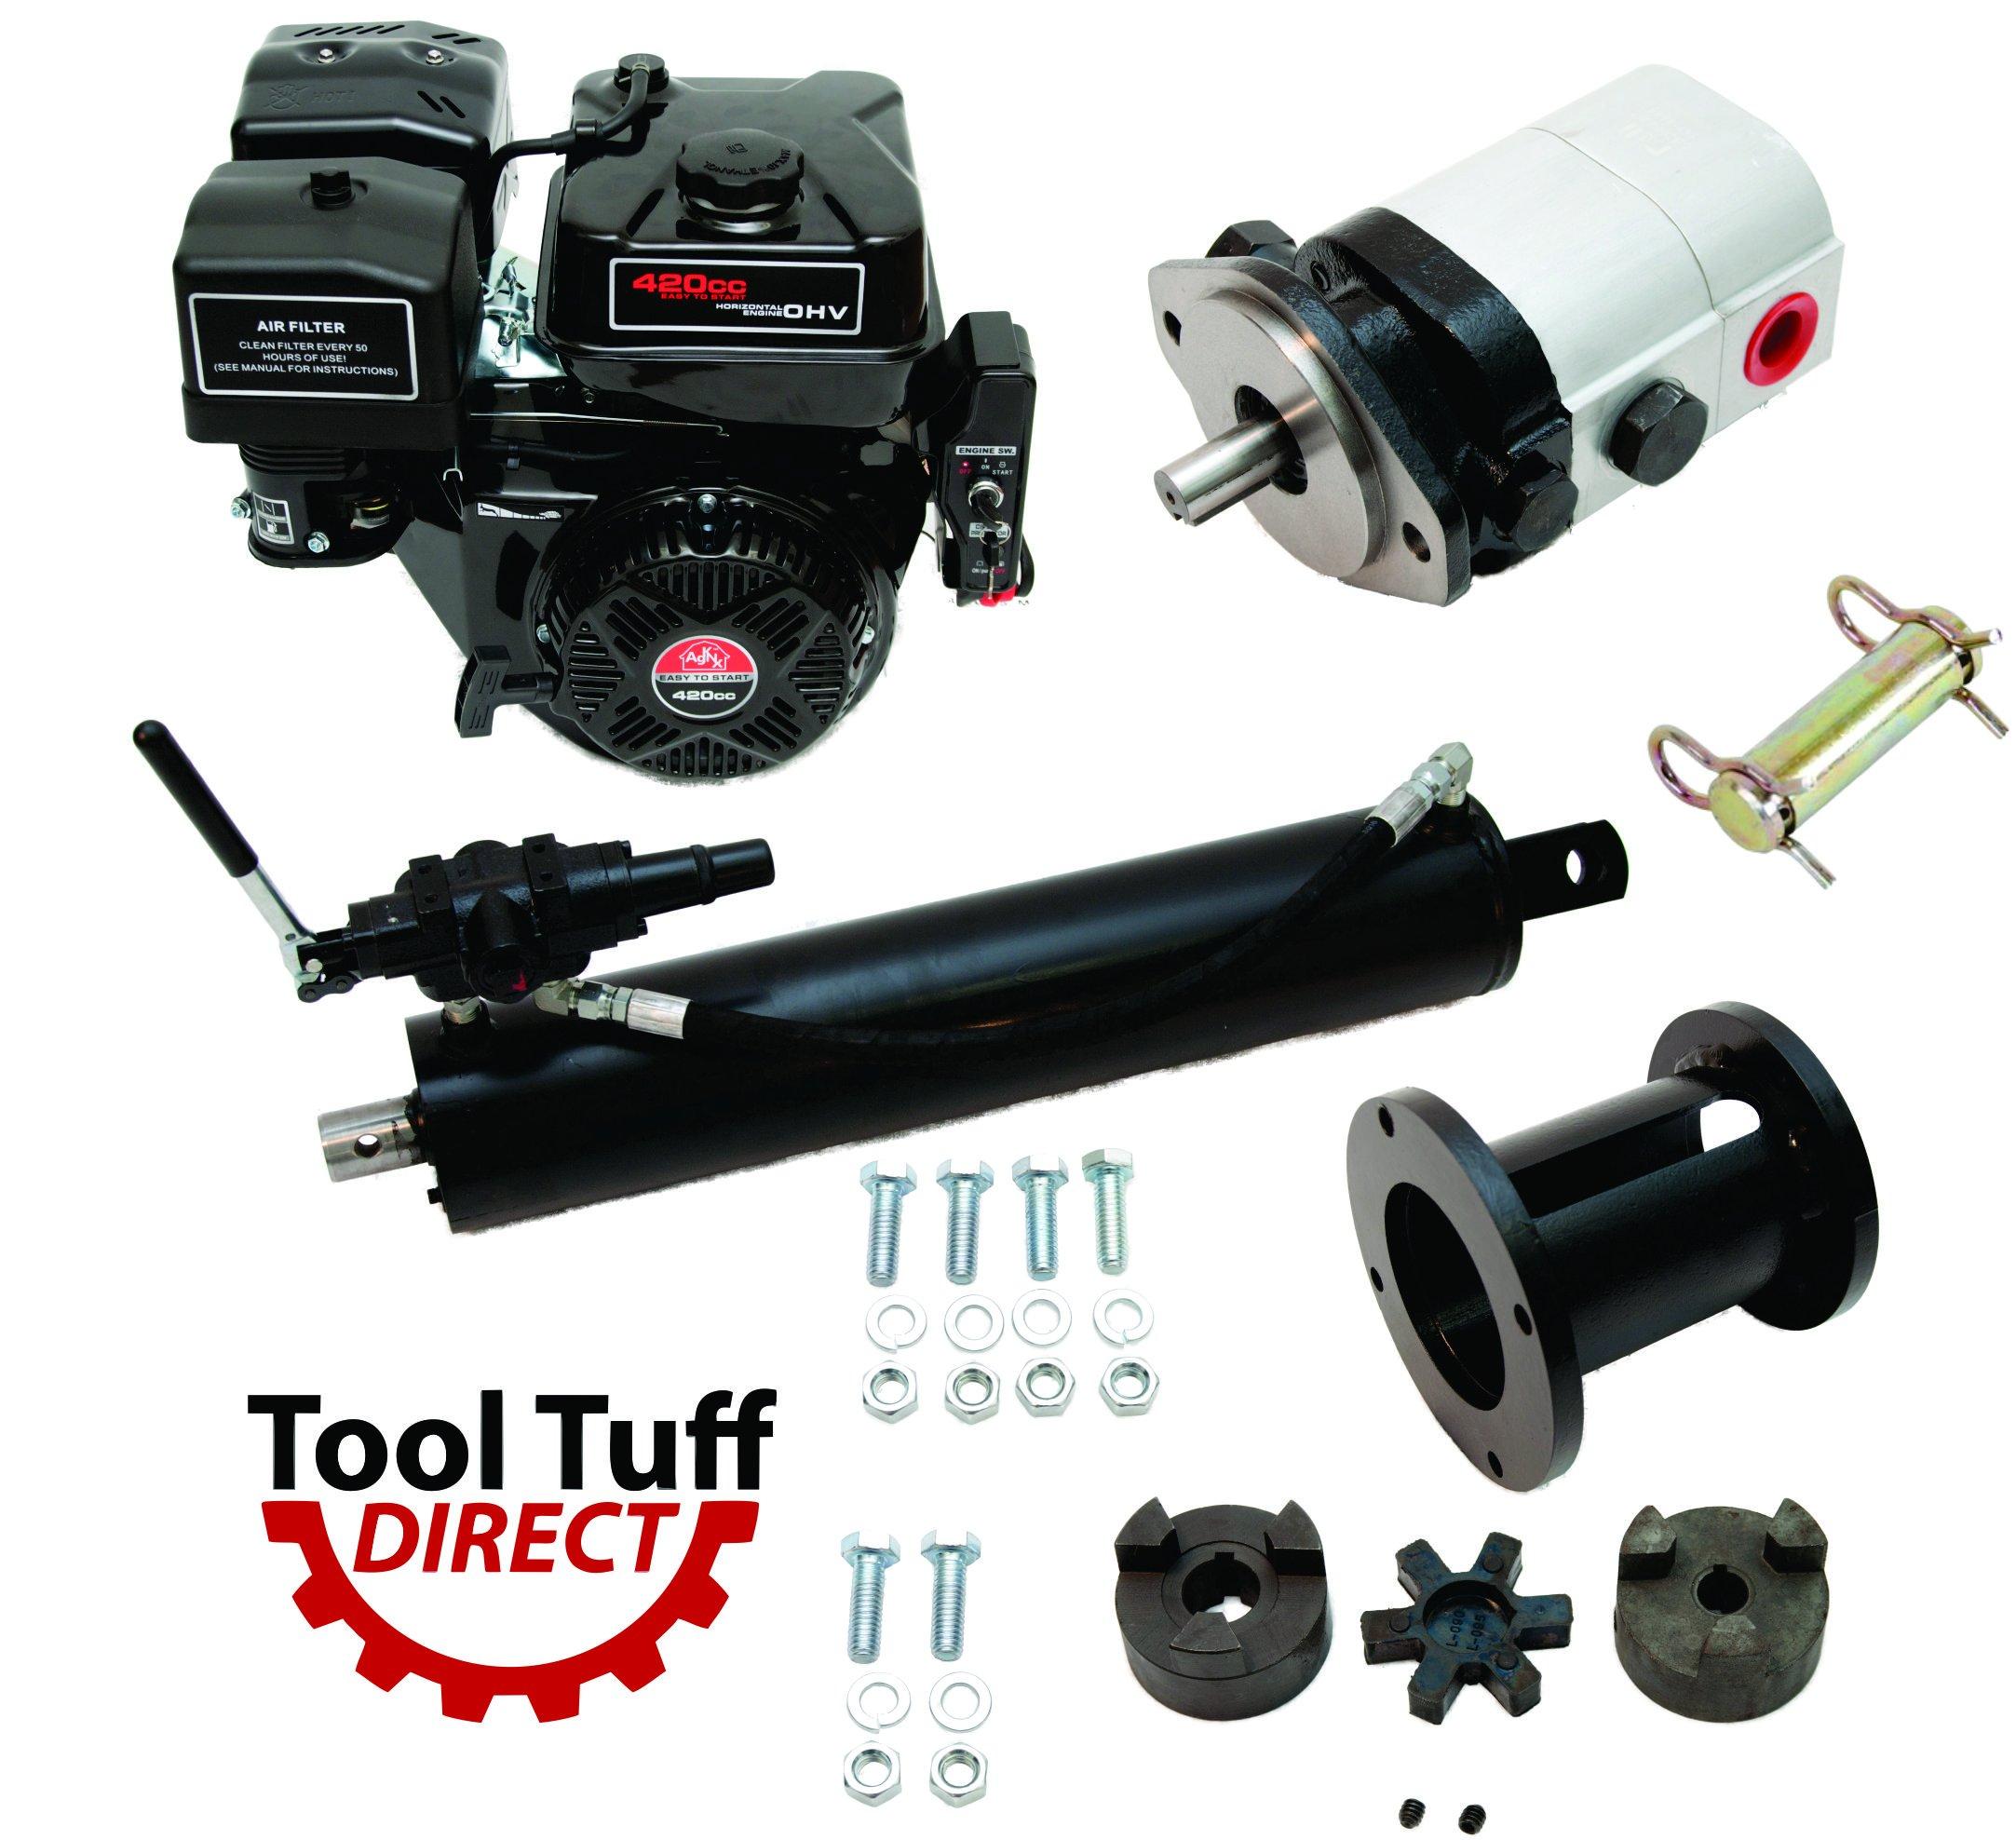 Tool Tuff Log Splitter Build Kit - 15 hp Electric-Start Engine, Mounting Bracket, 28 GPM Pump, Auto-Return Valve, LO100 Coupler, 5'' Cylinder & Hardware